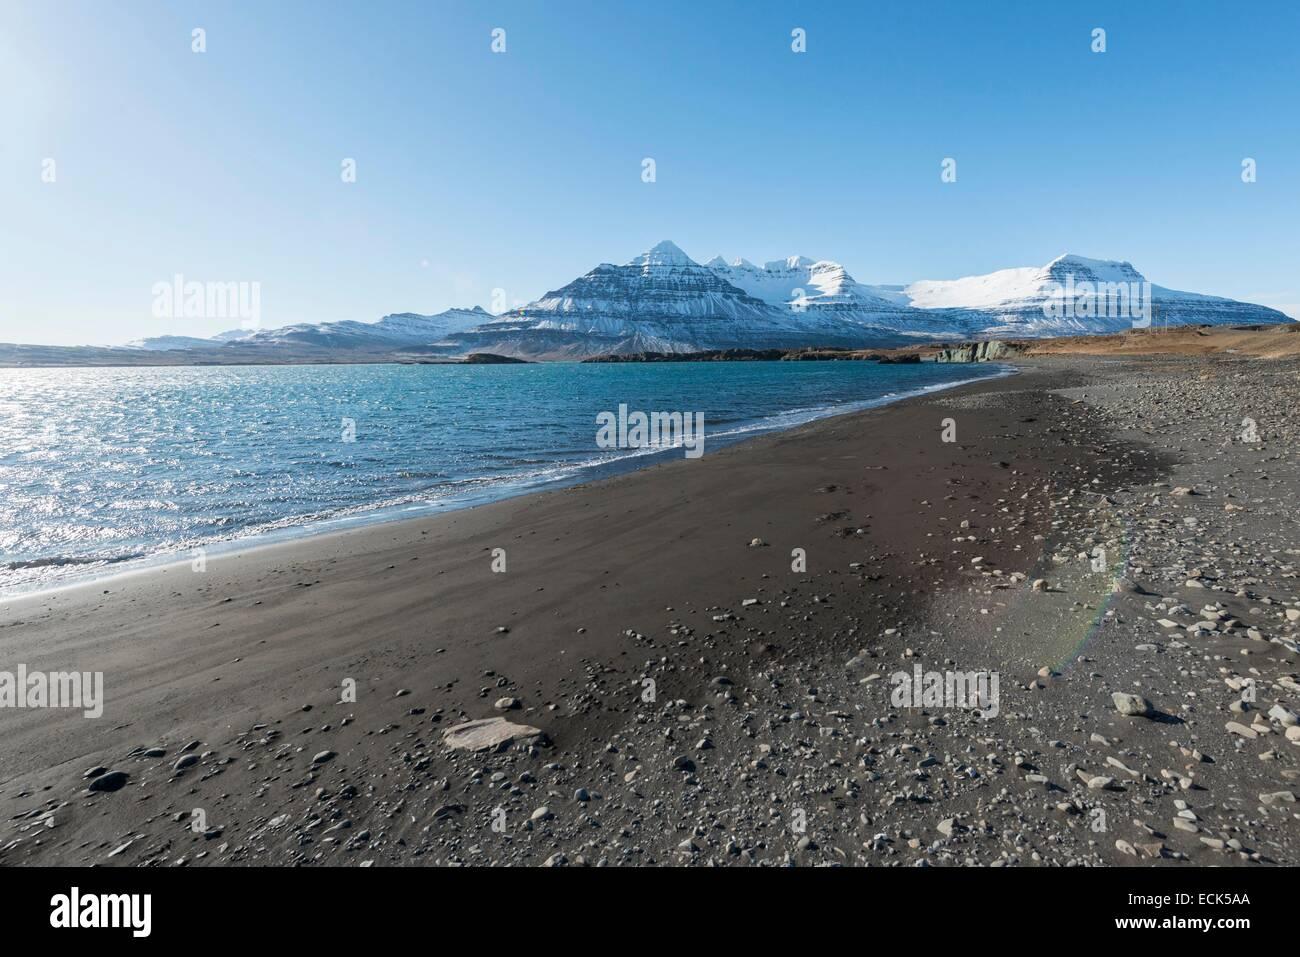 Iceland, Austurland region, landscape of the east fjords - Stock Image